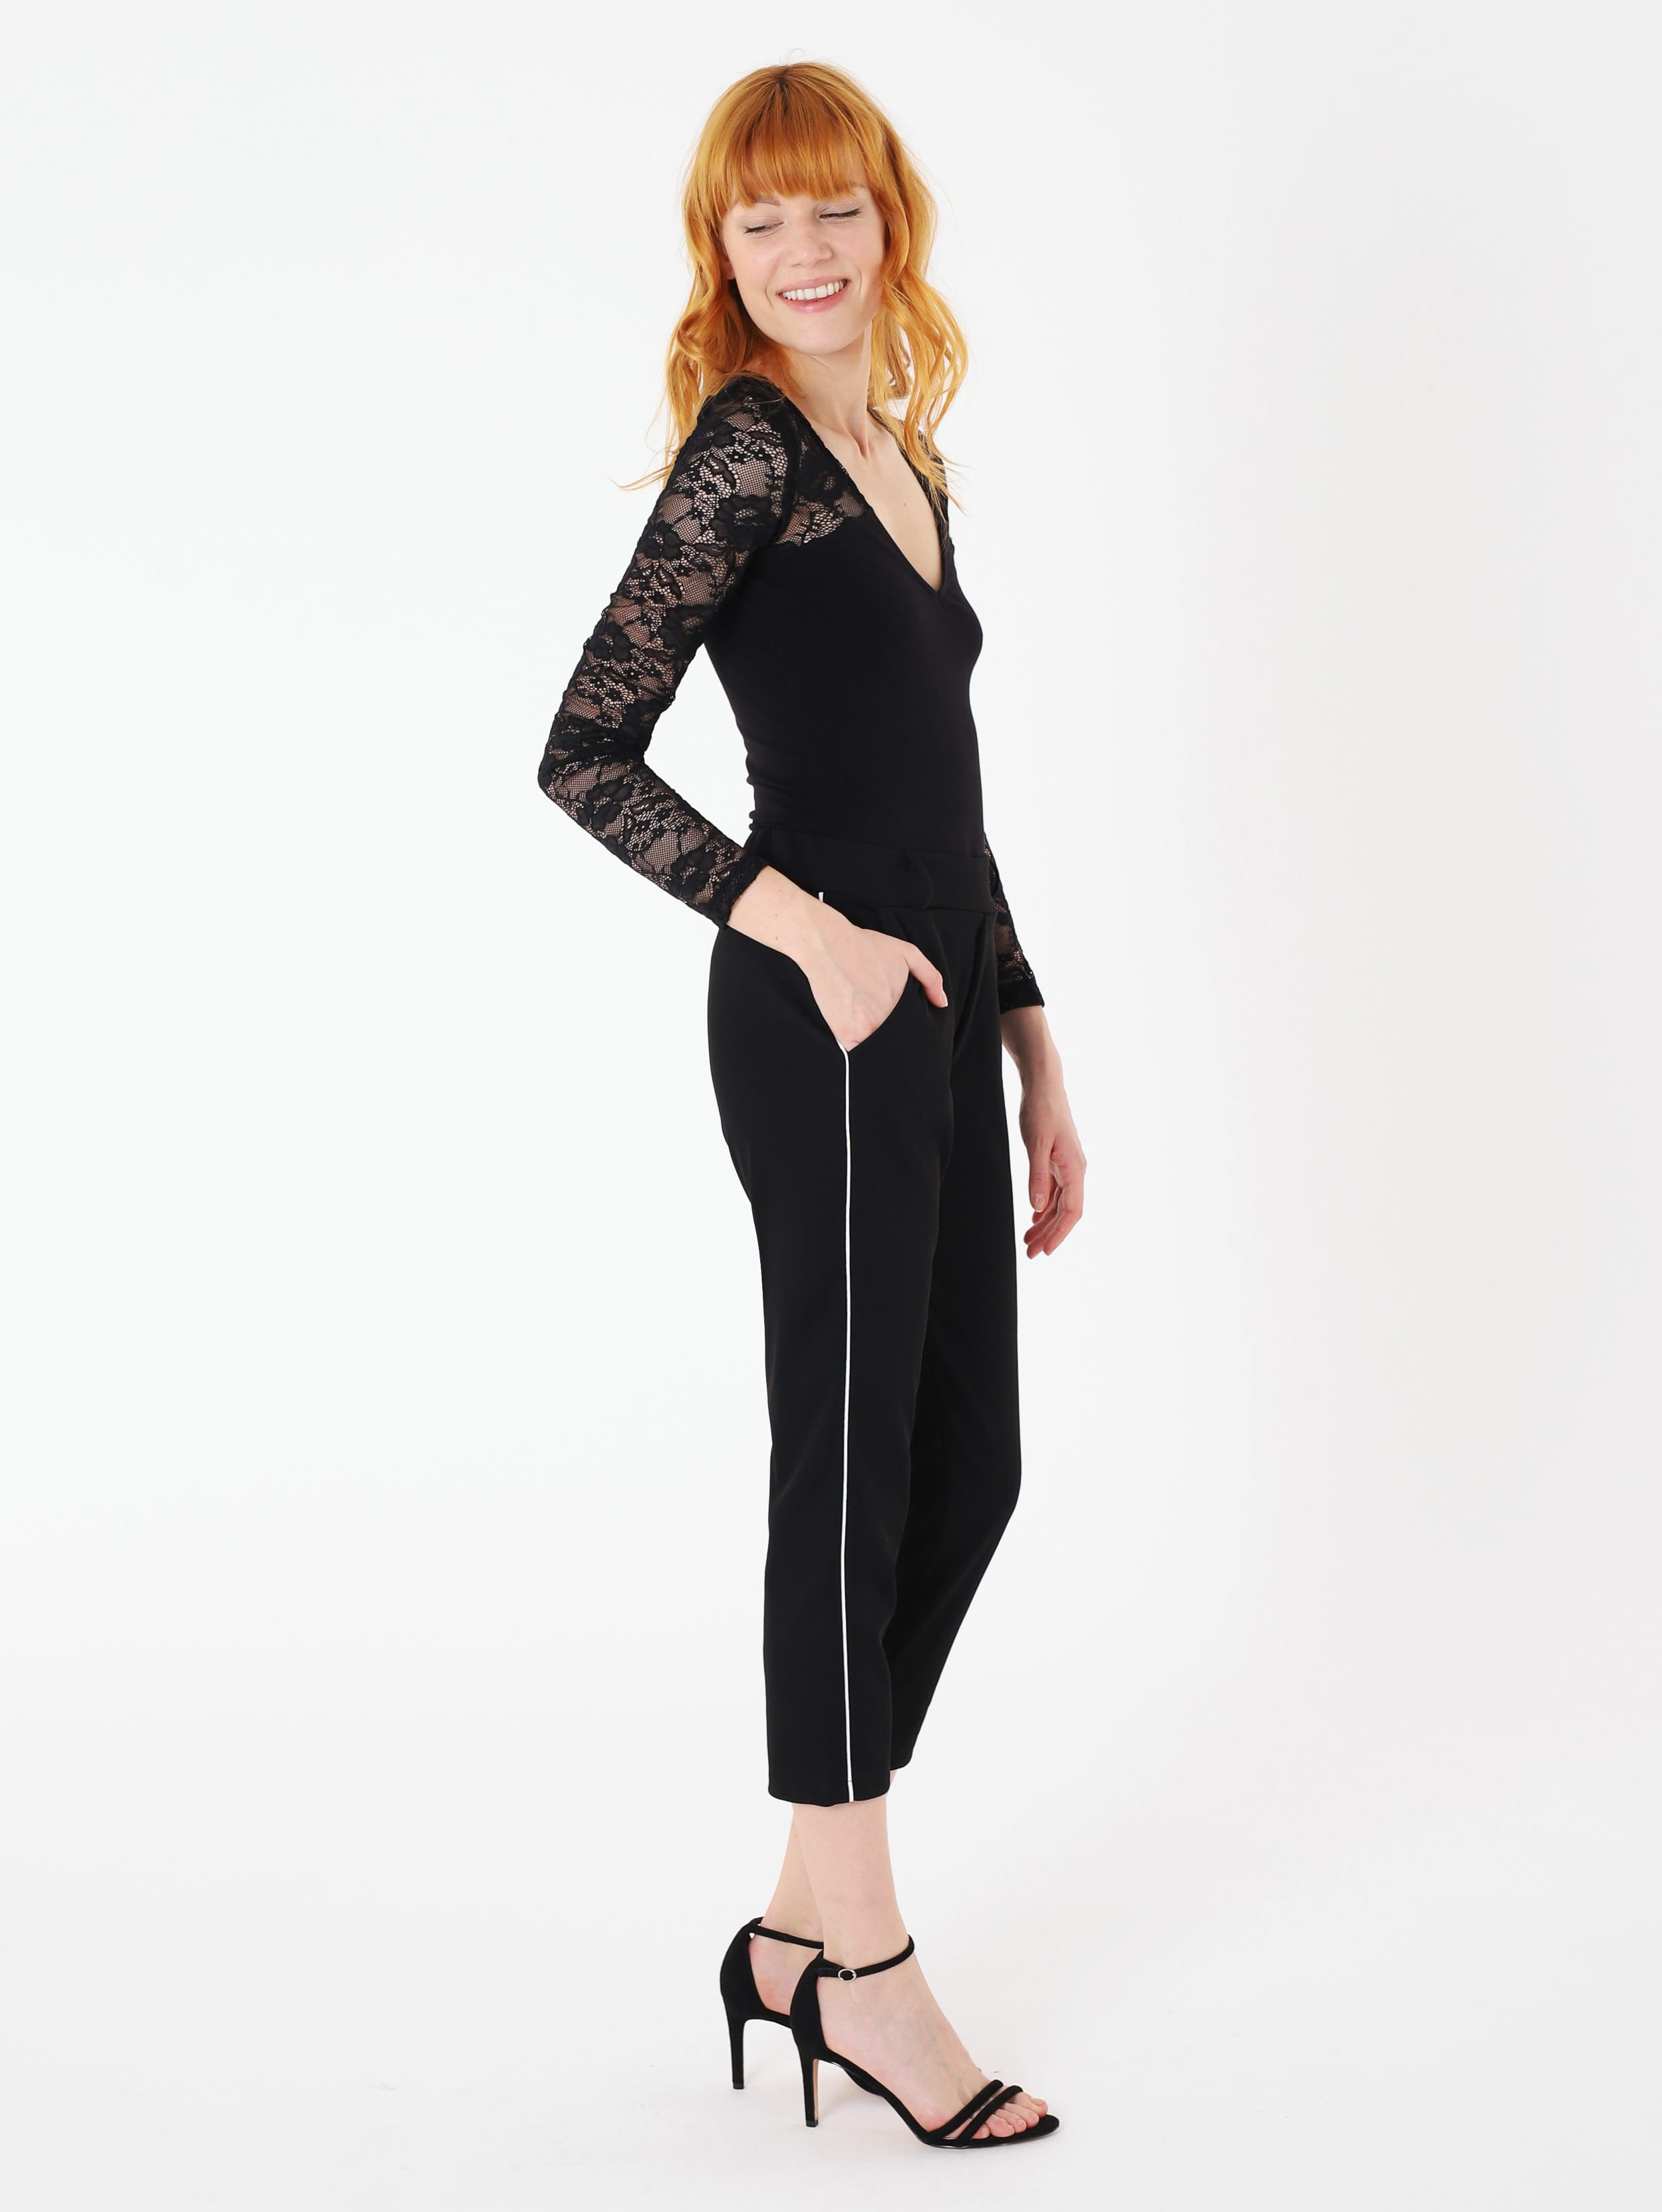 Pantaloni chinos neri Terranova a 19,99 euro